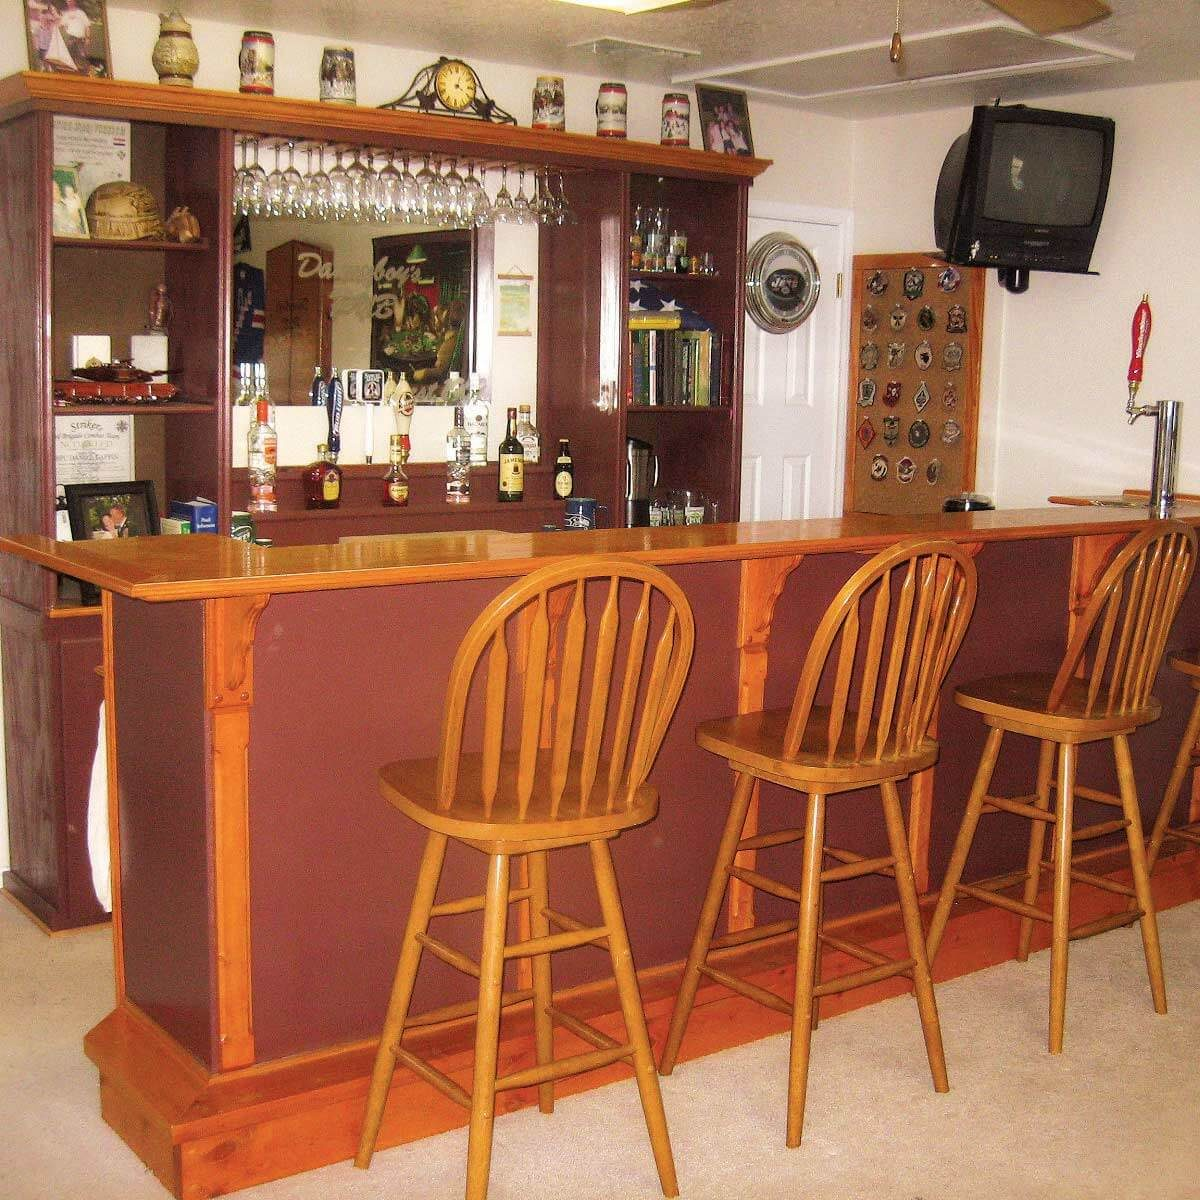 Man cave bar or pub